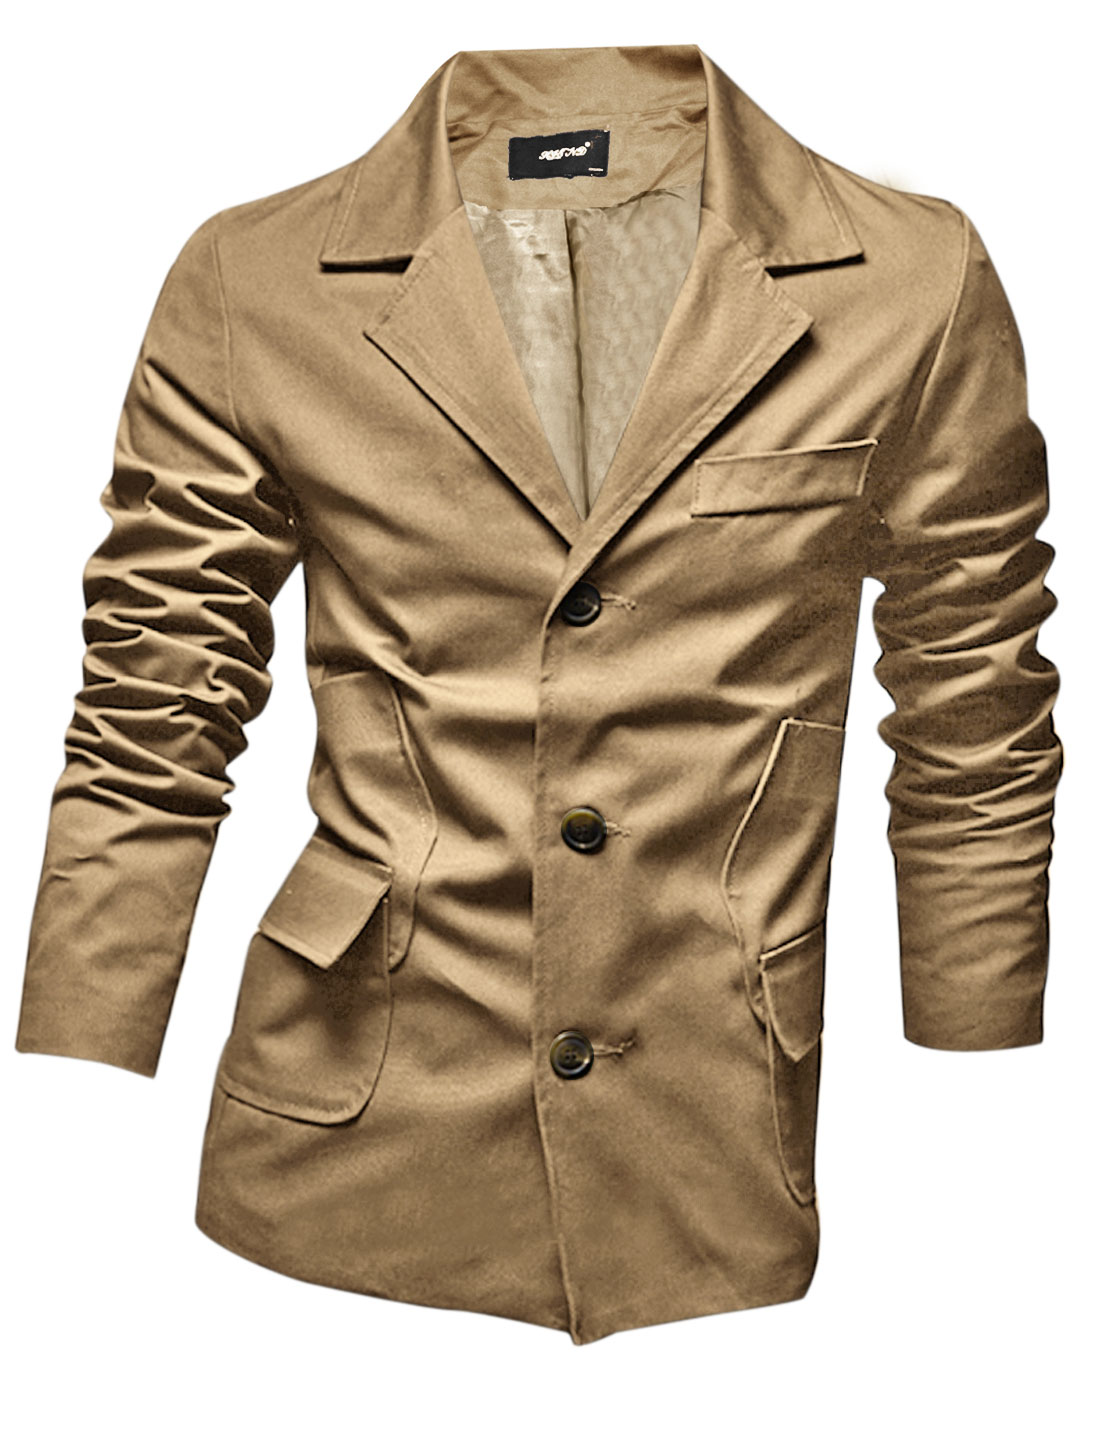 Men Notched Lapel Single Three Buttons Casual Blazer Jacket Khaki M